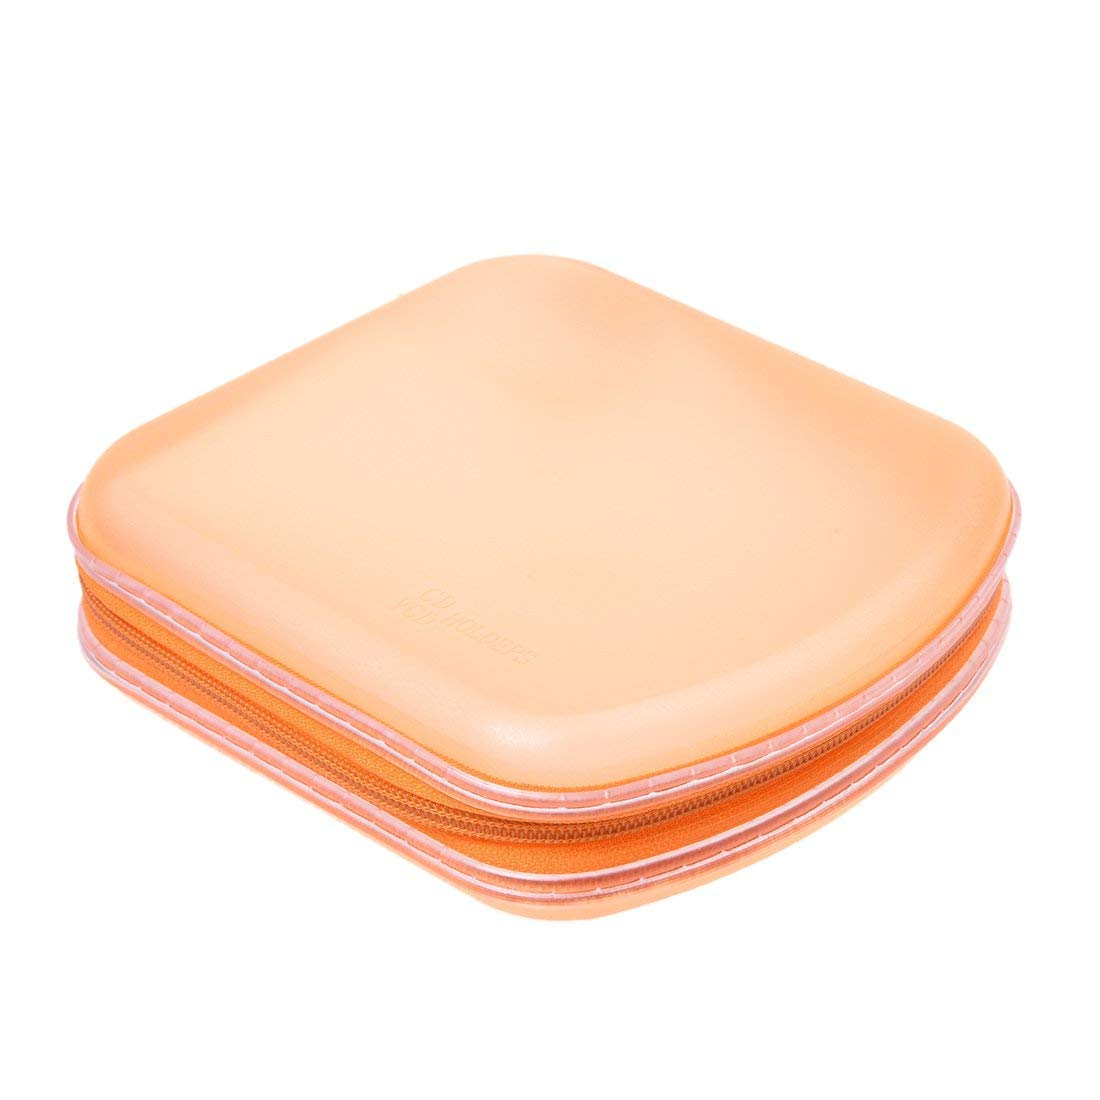 RALMALL 40 Disc CD DVD VCD DJ Storage Media Holder Sleeve Case Hard Box Wallet Carry Bag